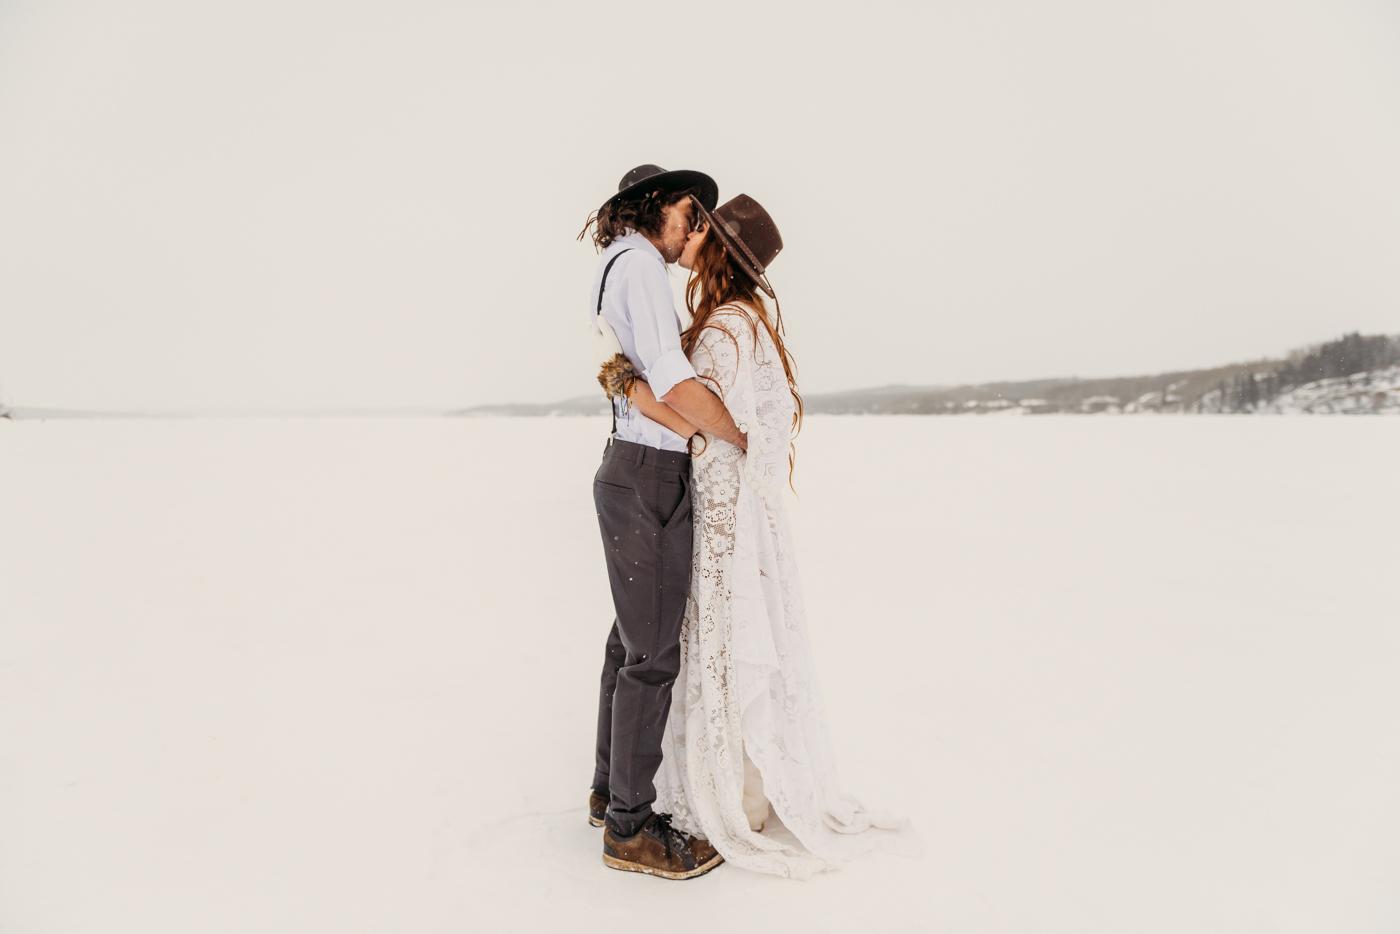 FortSt.John_photographer_TyraEPhotography_Wedding_Couple_Family_Photograhy_DawsonCreek_Elopement_Bride_Boduoir_Portraits-4991.jpg